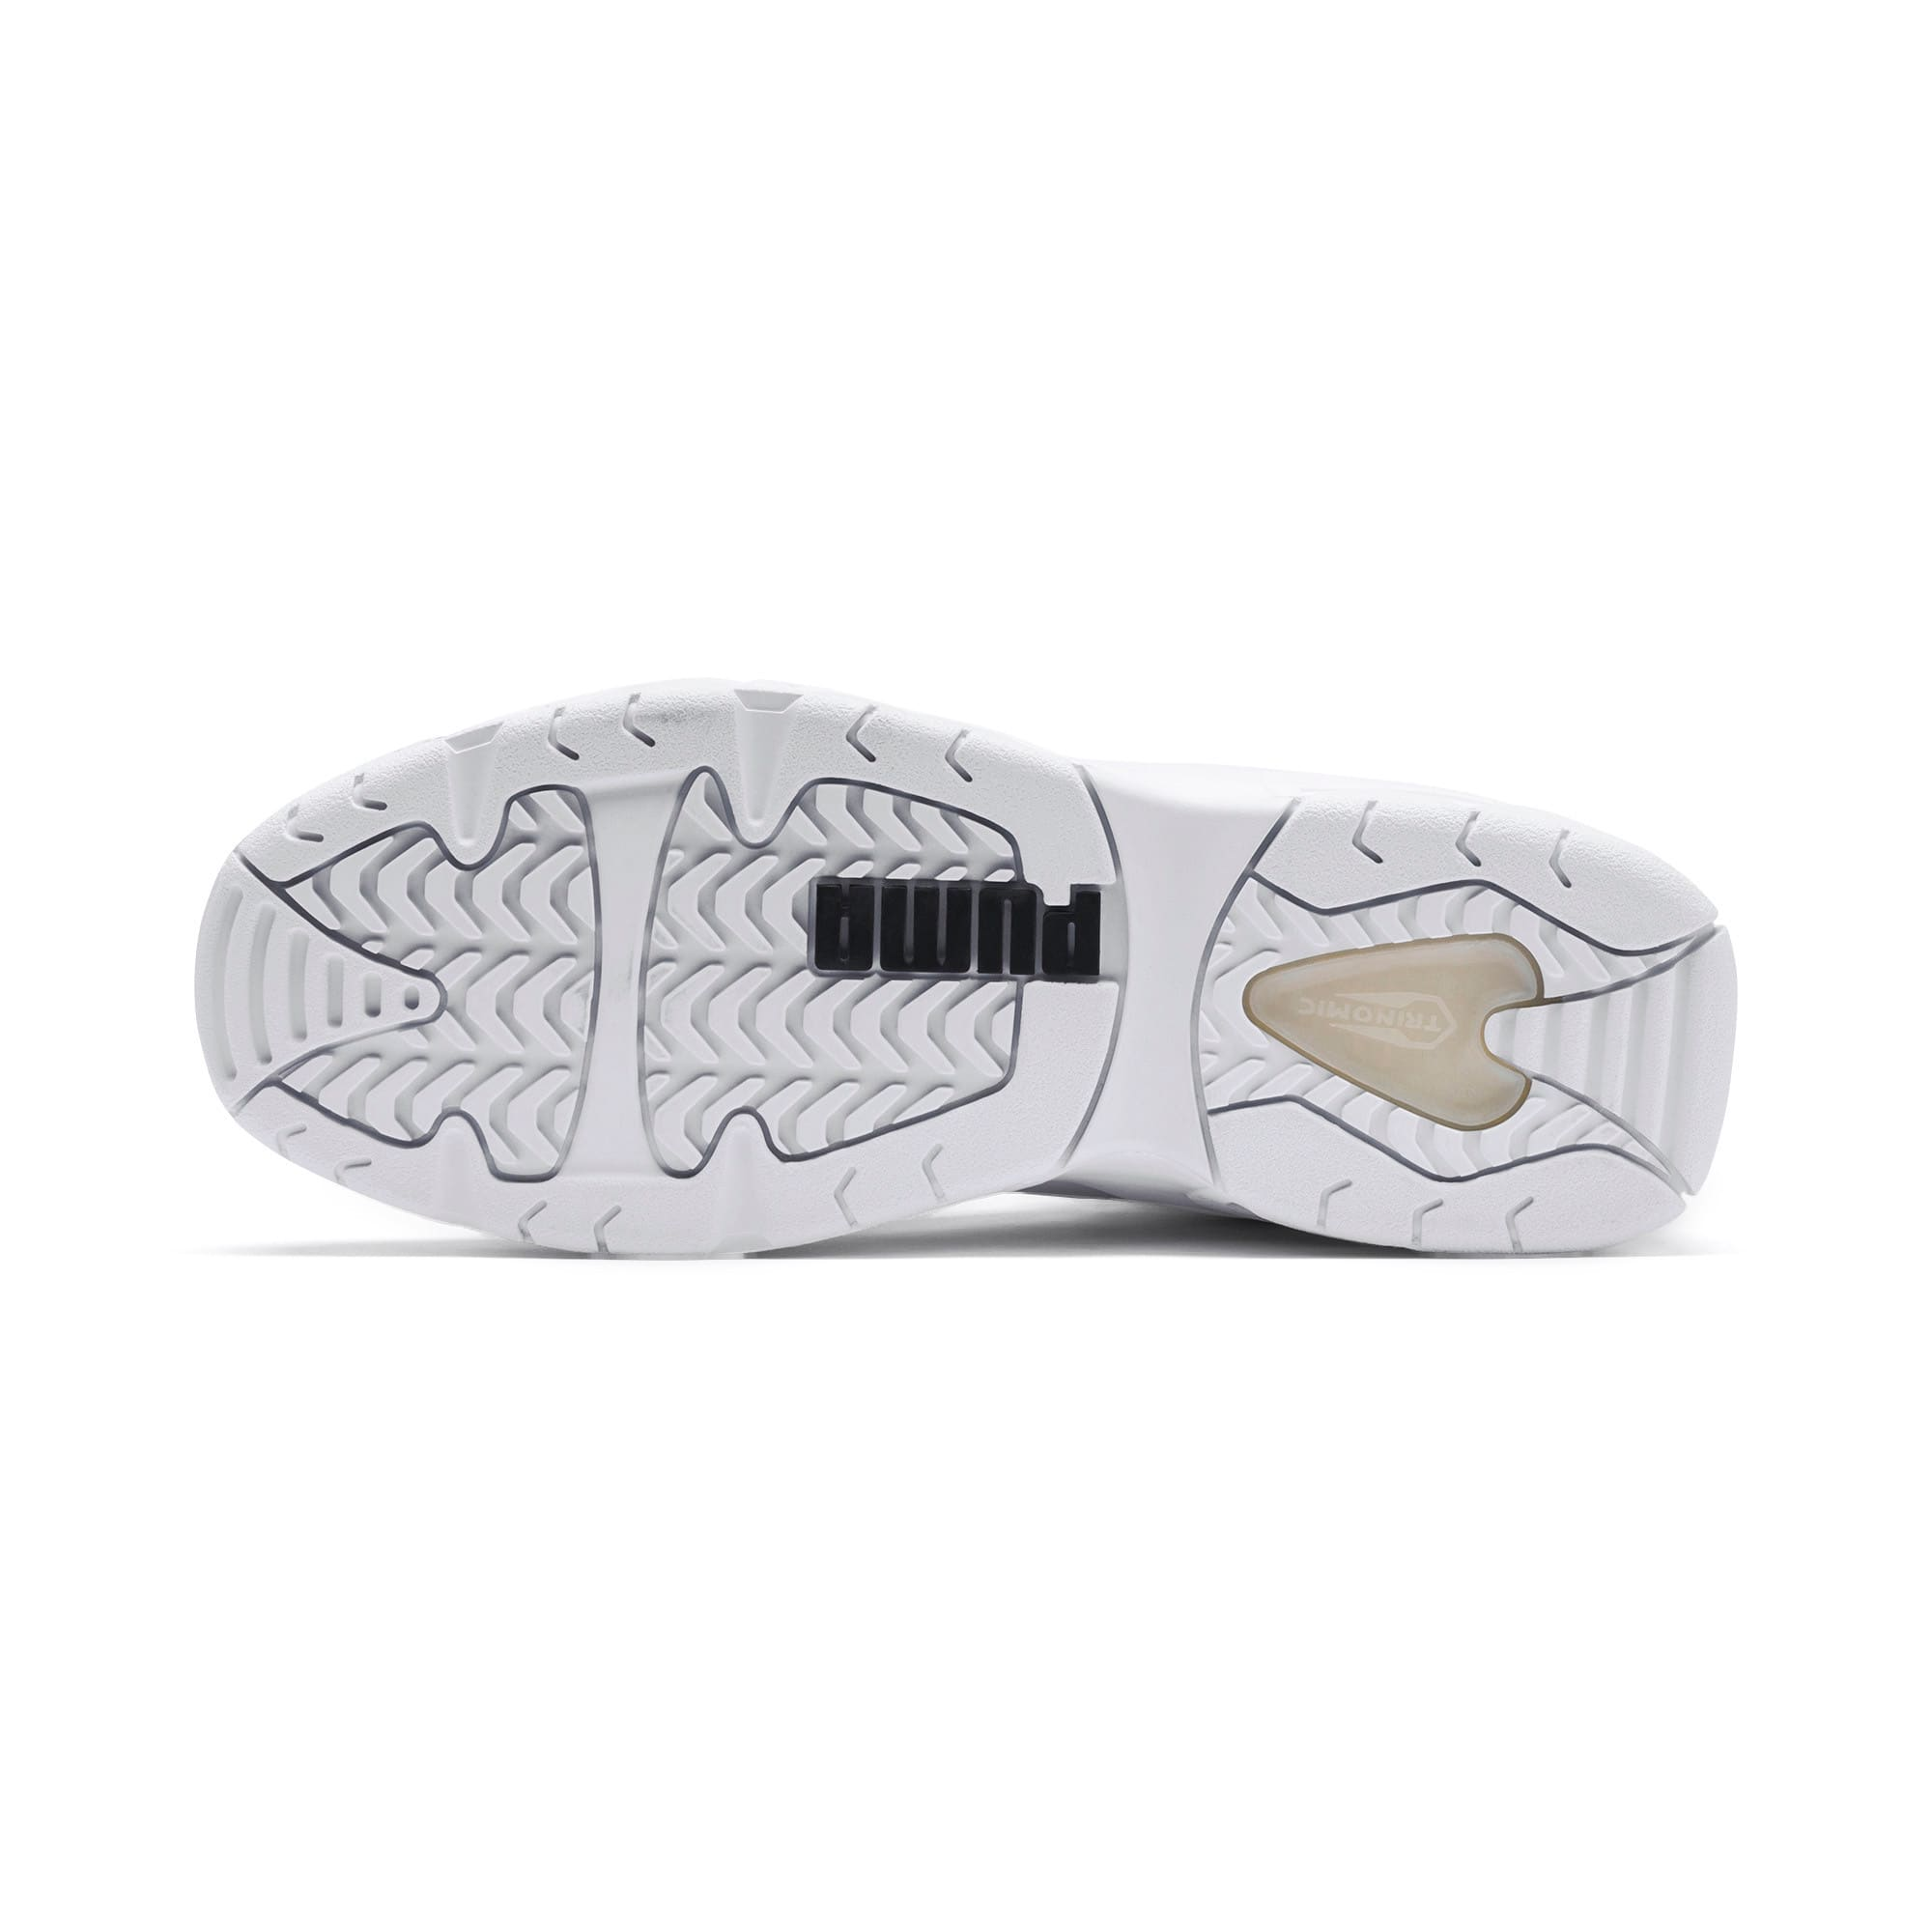 Thumbnail 3 of Source Mid Sneakers, Puma Black-Puma White, medium